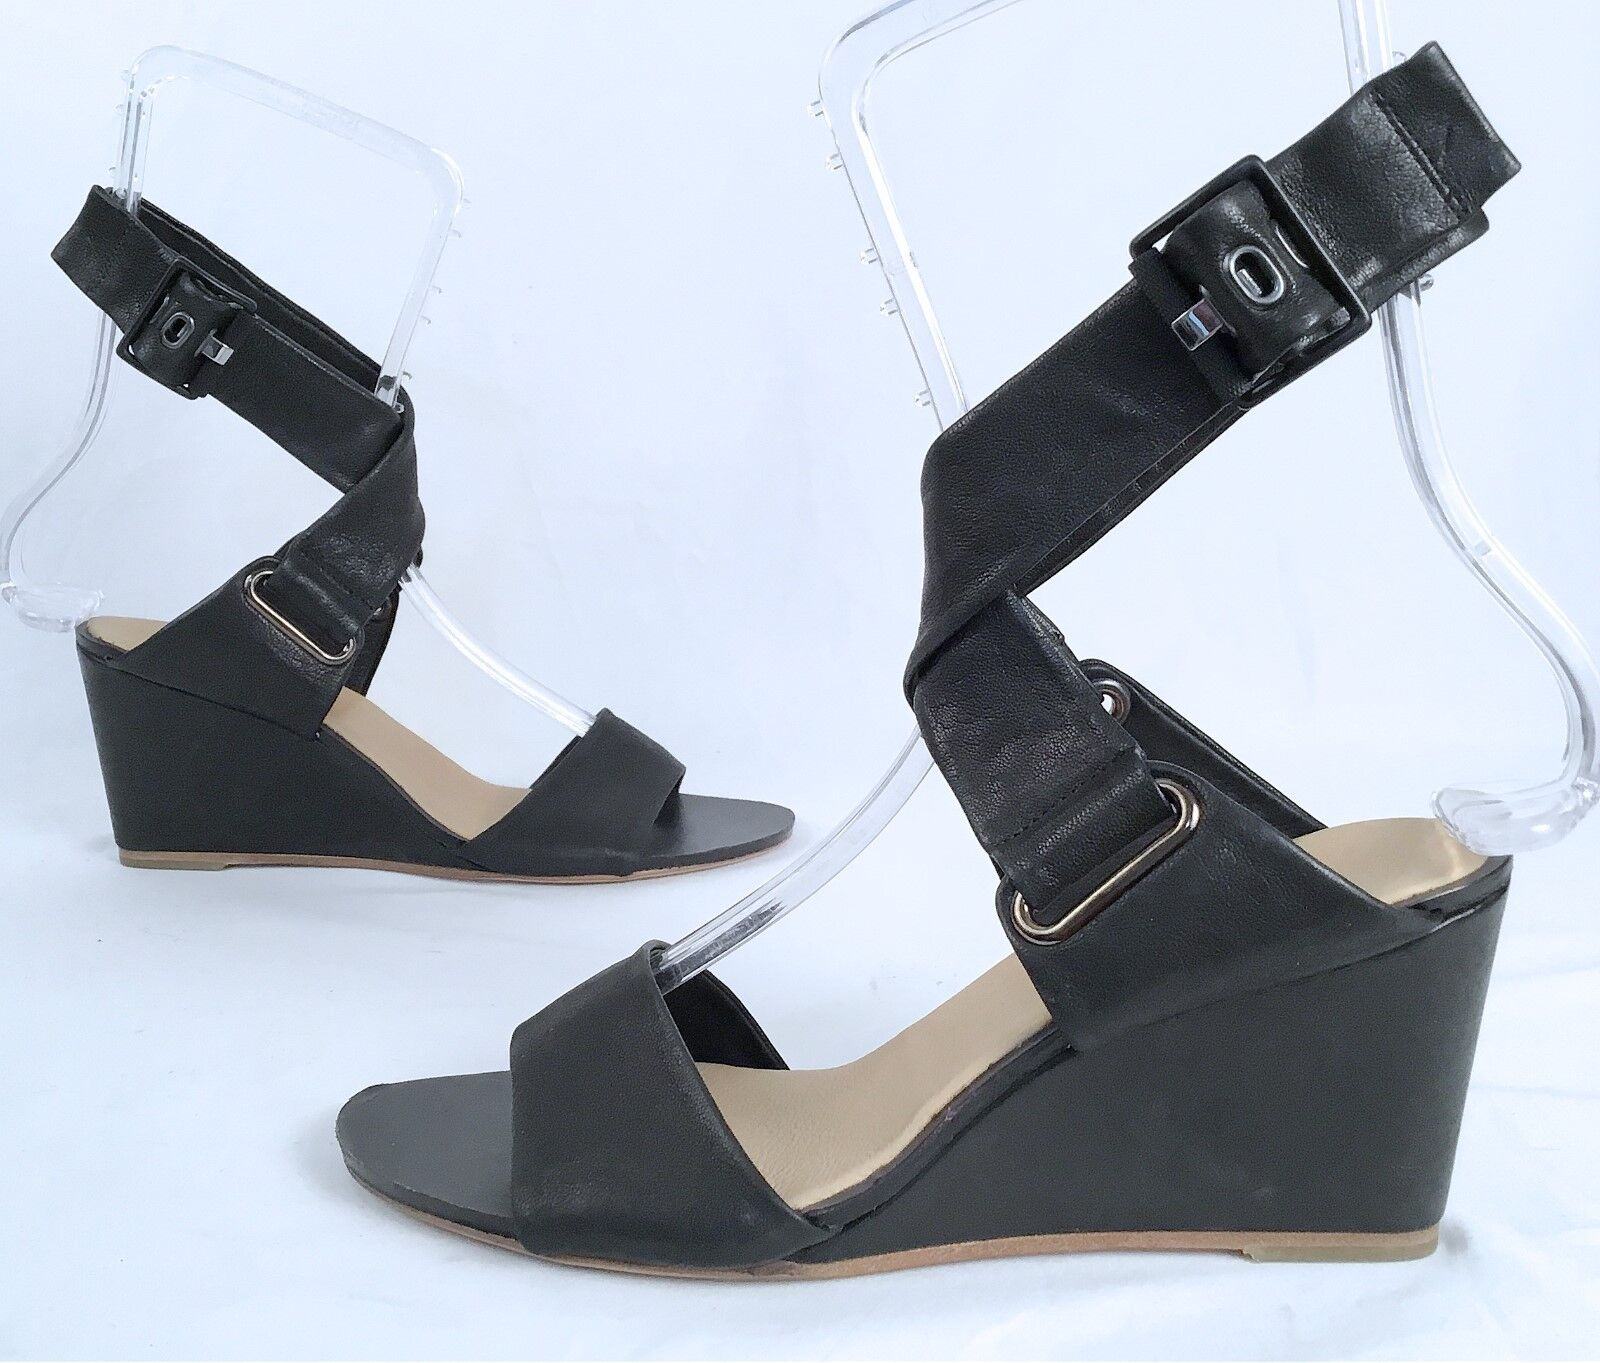 New   rag & bone 'Damien' Sandal- Black-  Size 7.5 US  37.5 EU   450 (J2)